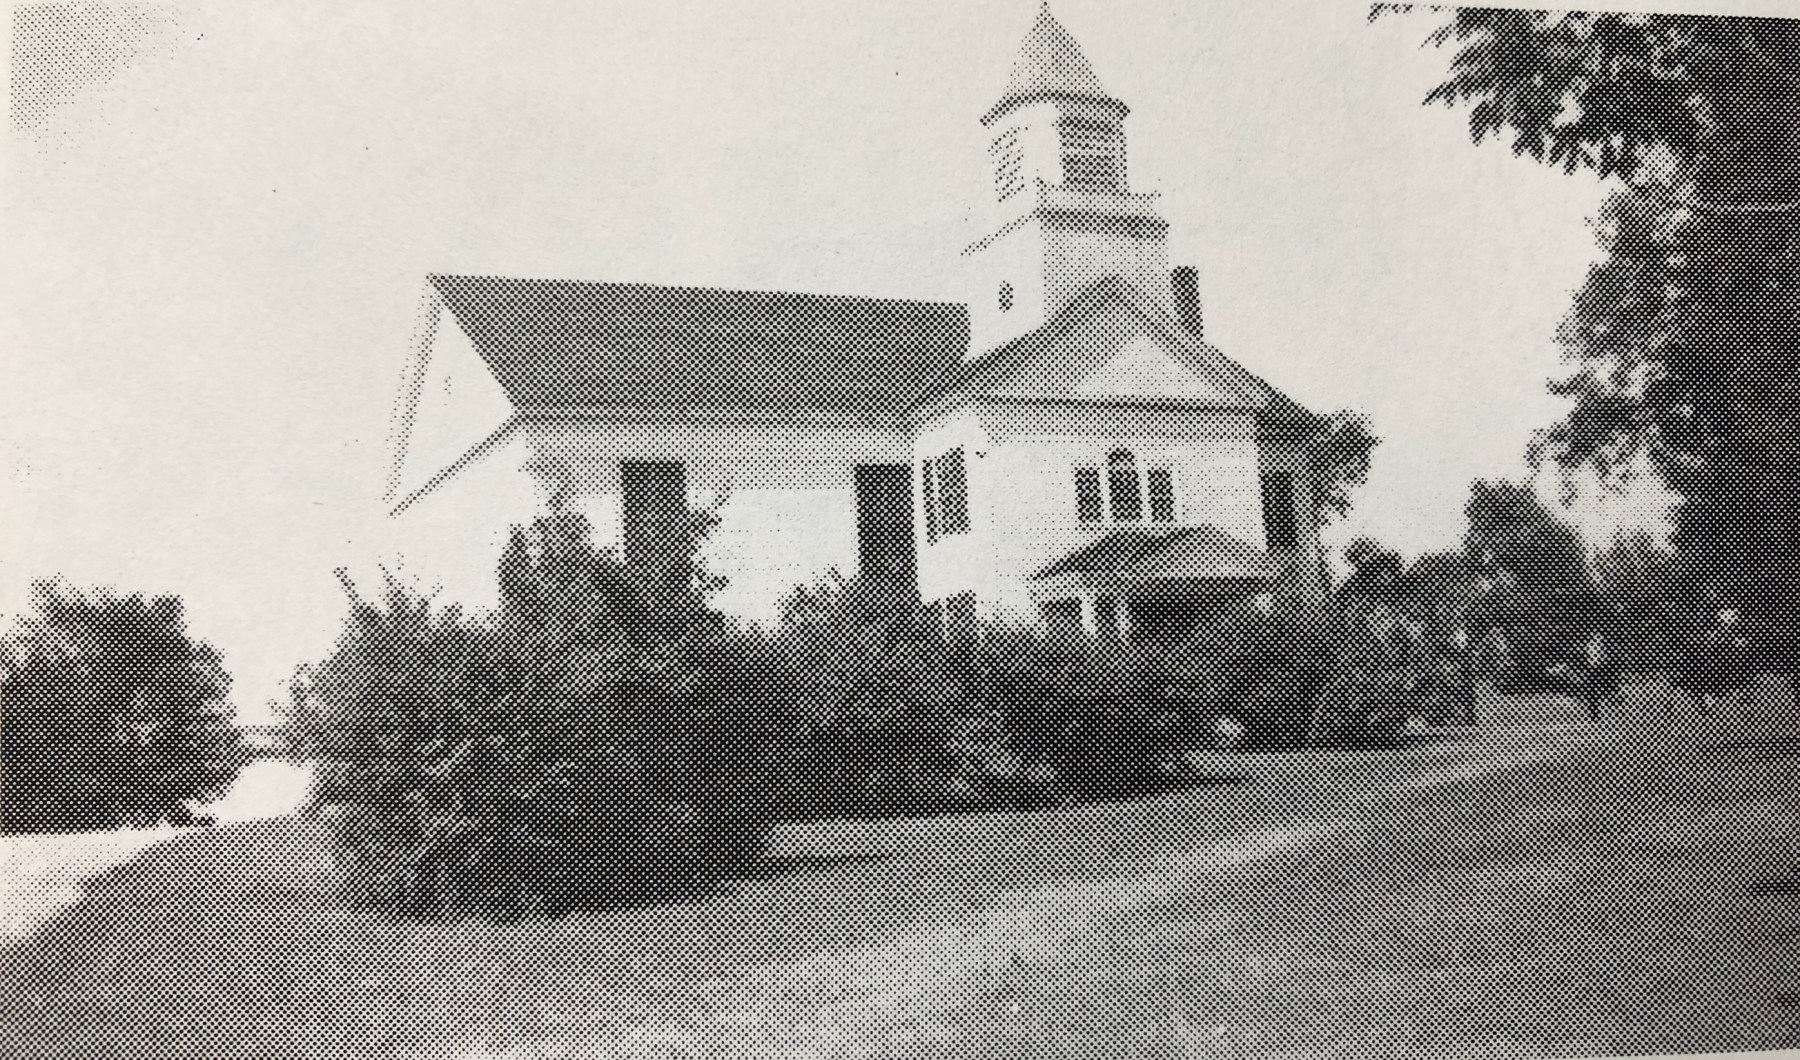 Church of Christ built in 1732, Lexington Street